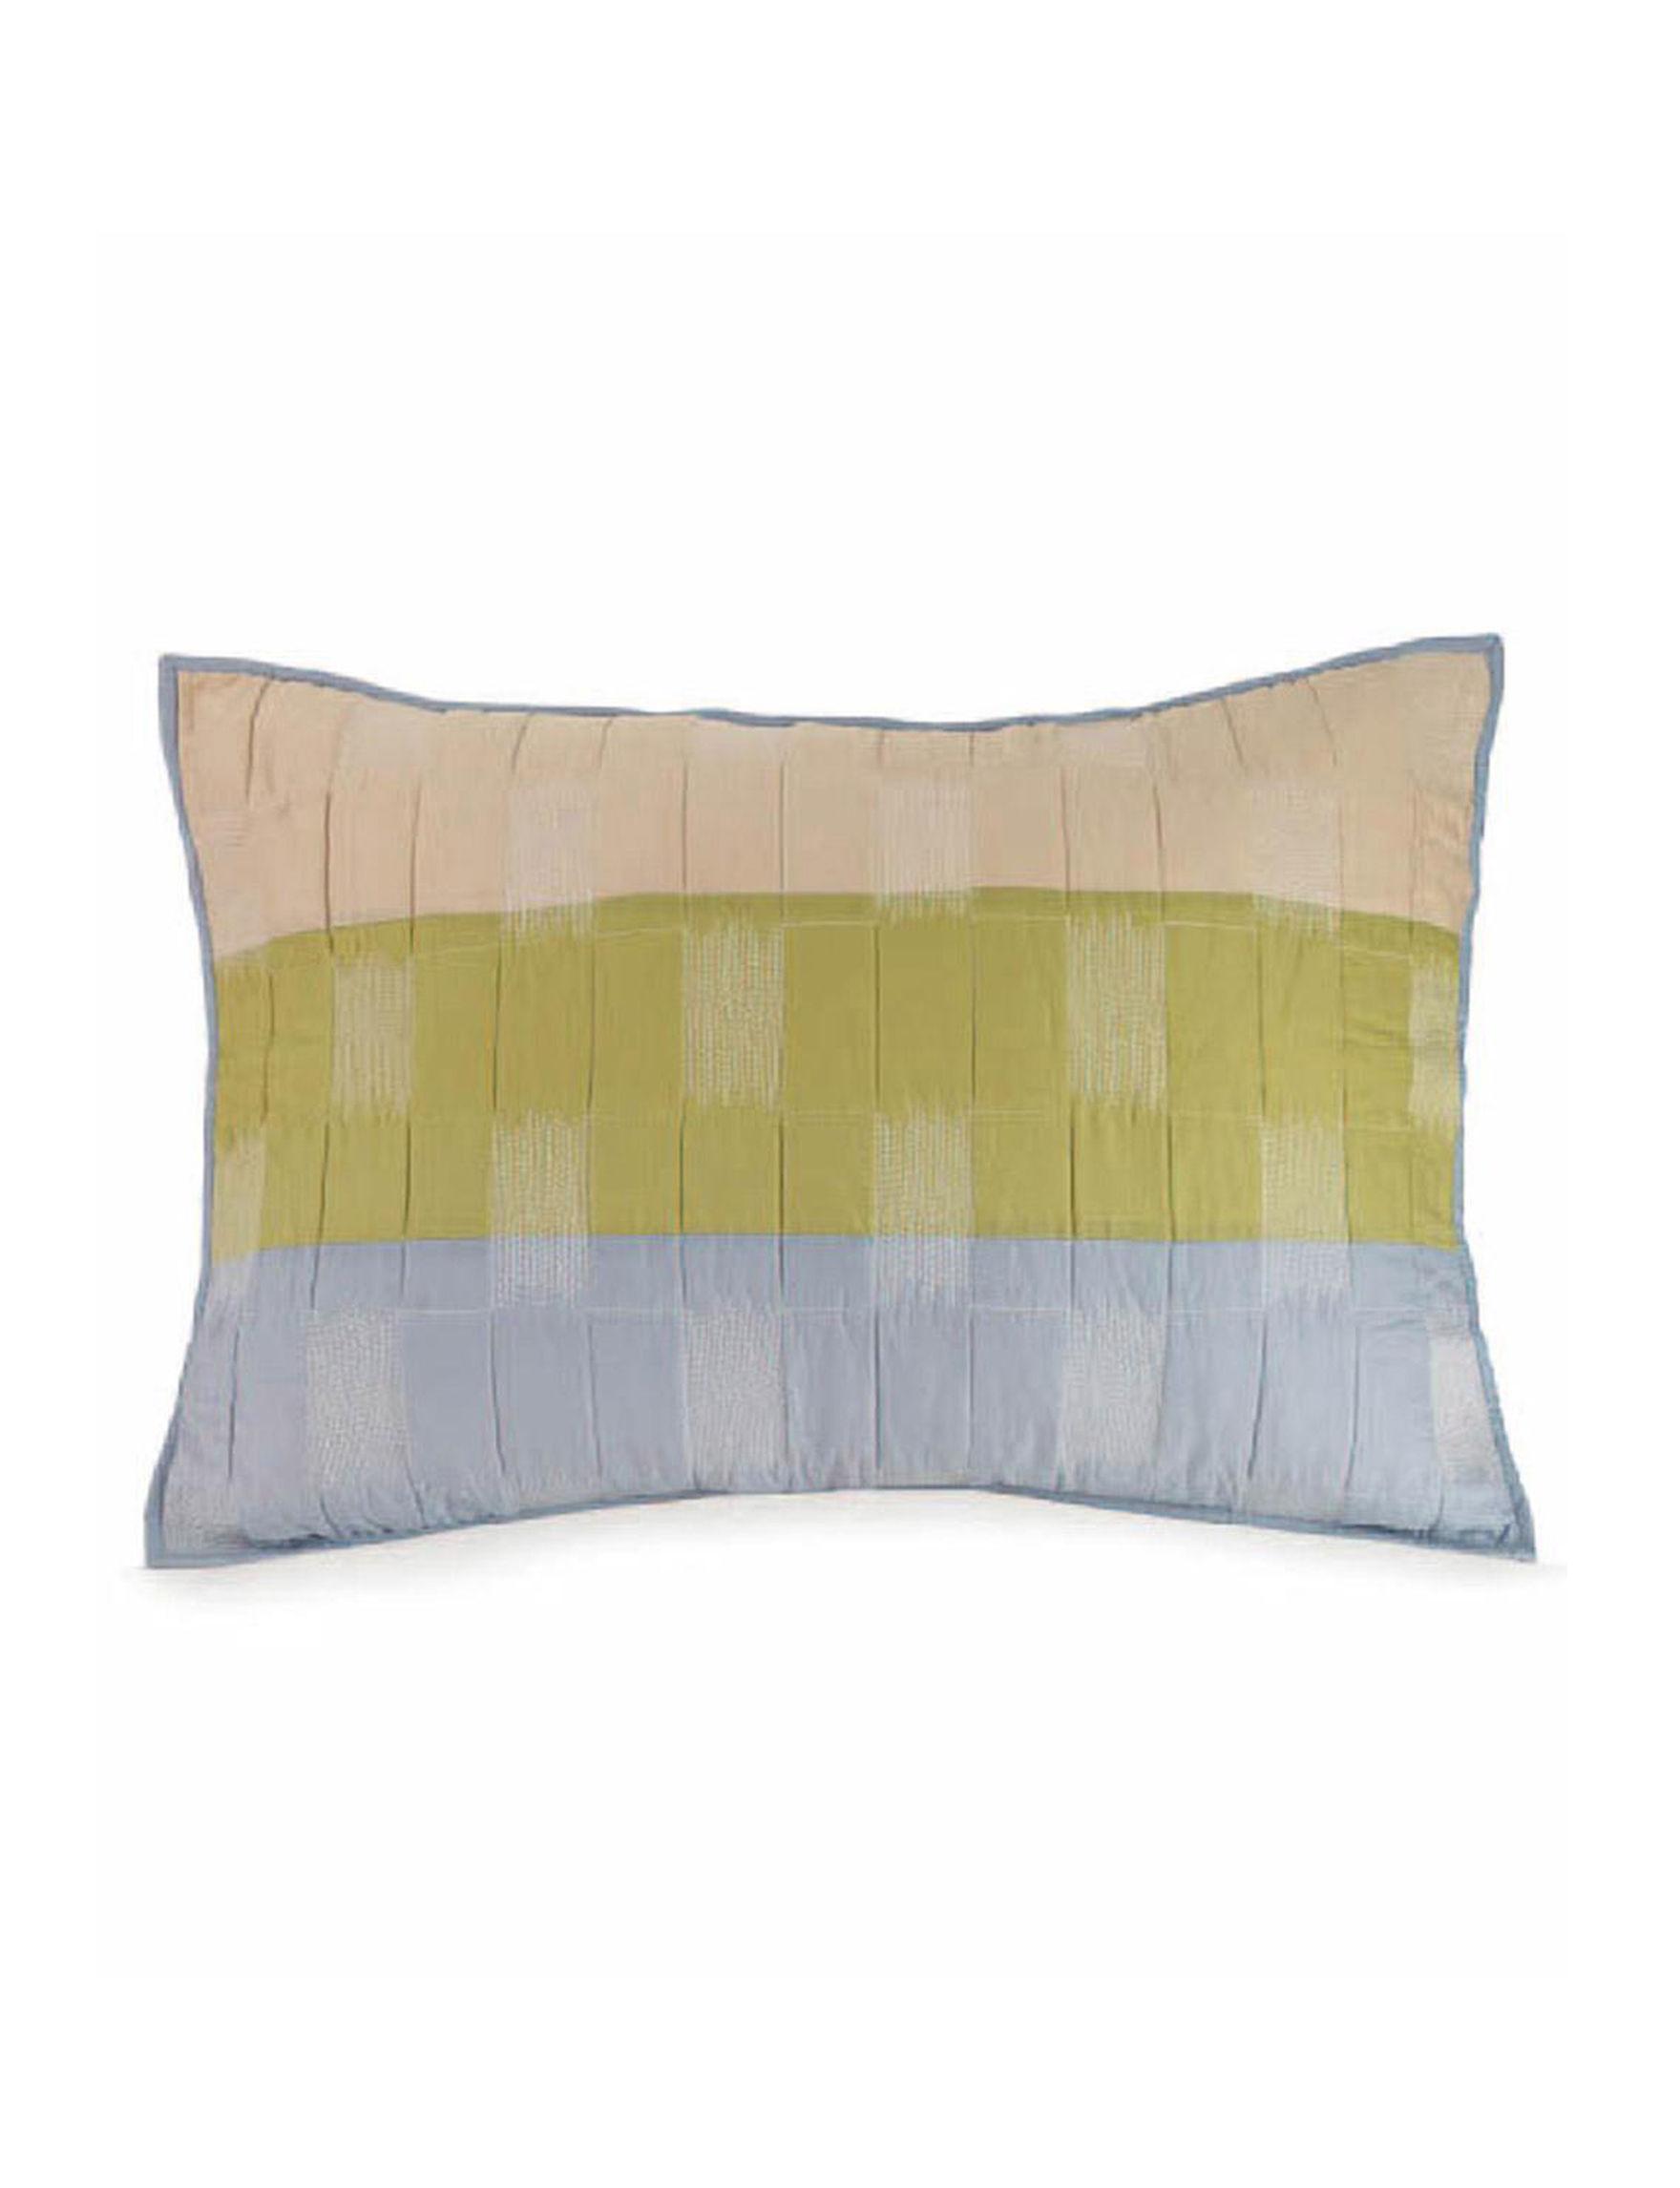 Presidio Square Blue/ Green/ Beige Pillow Shams